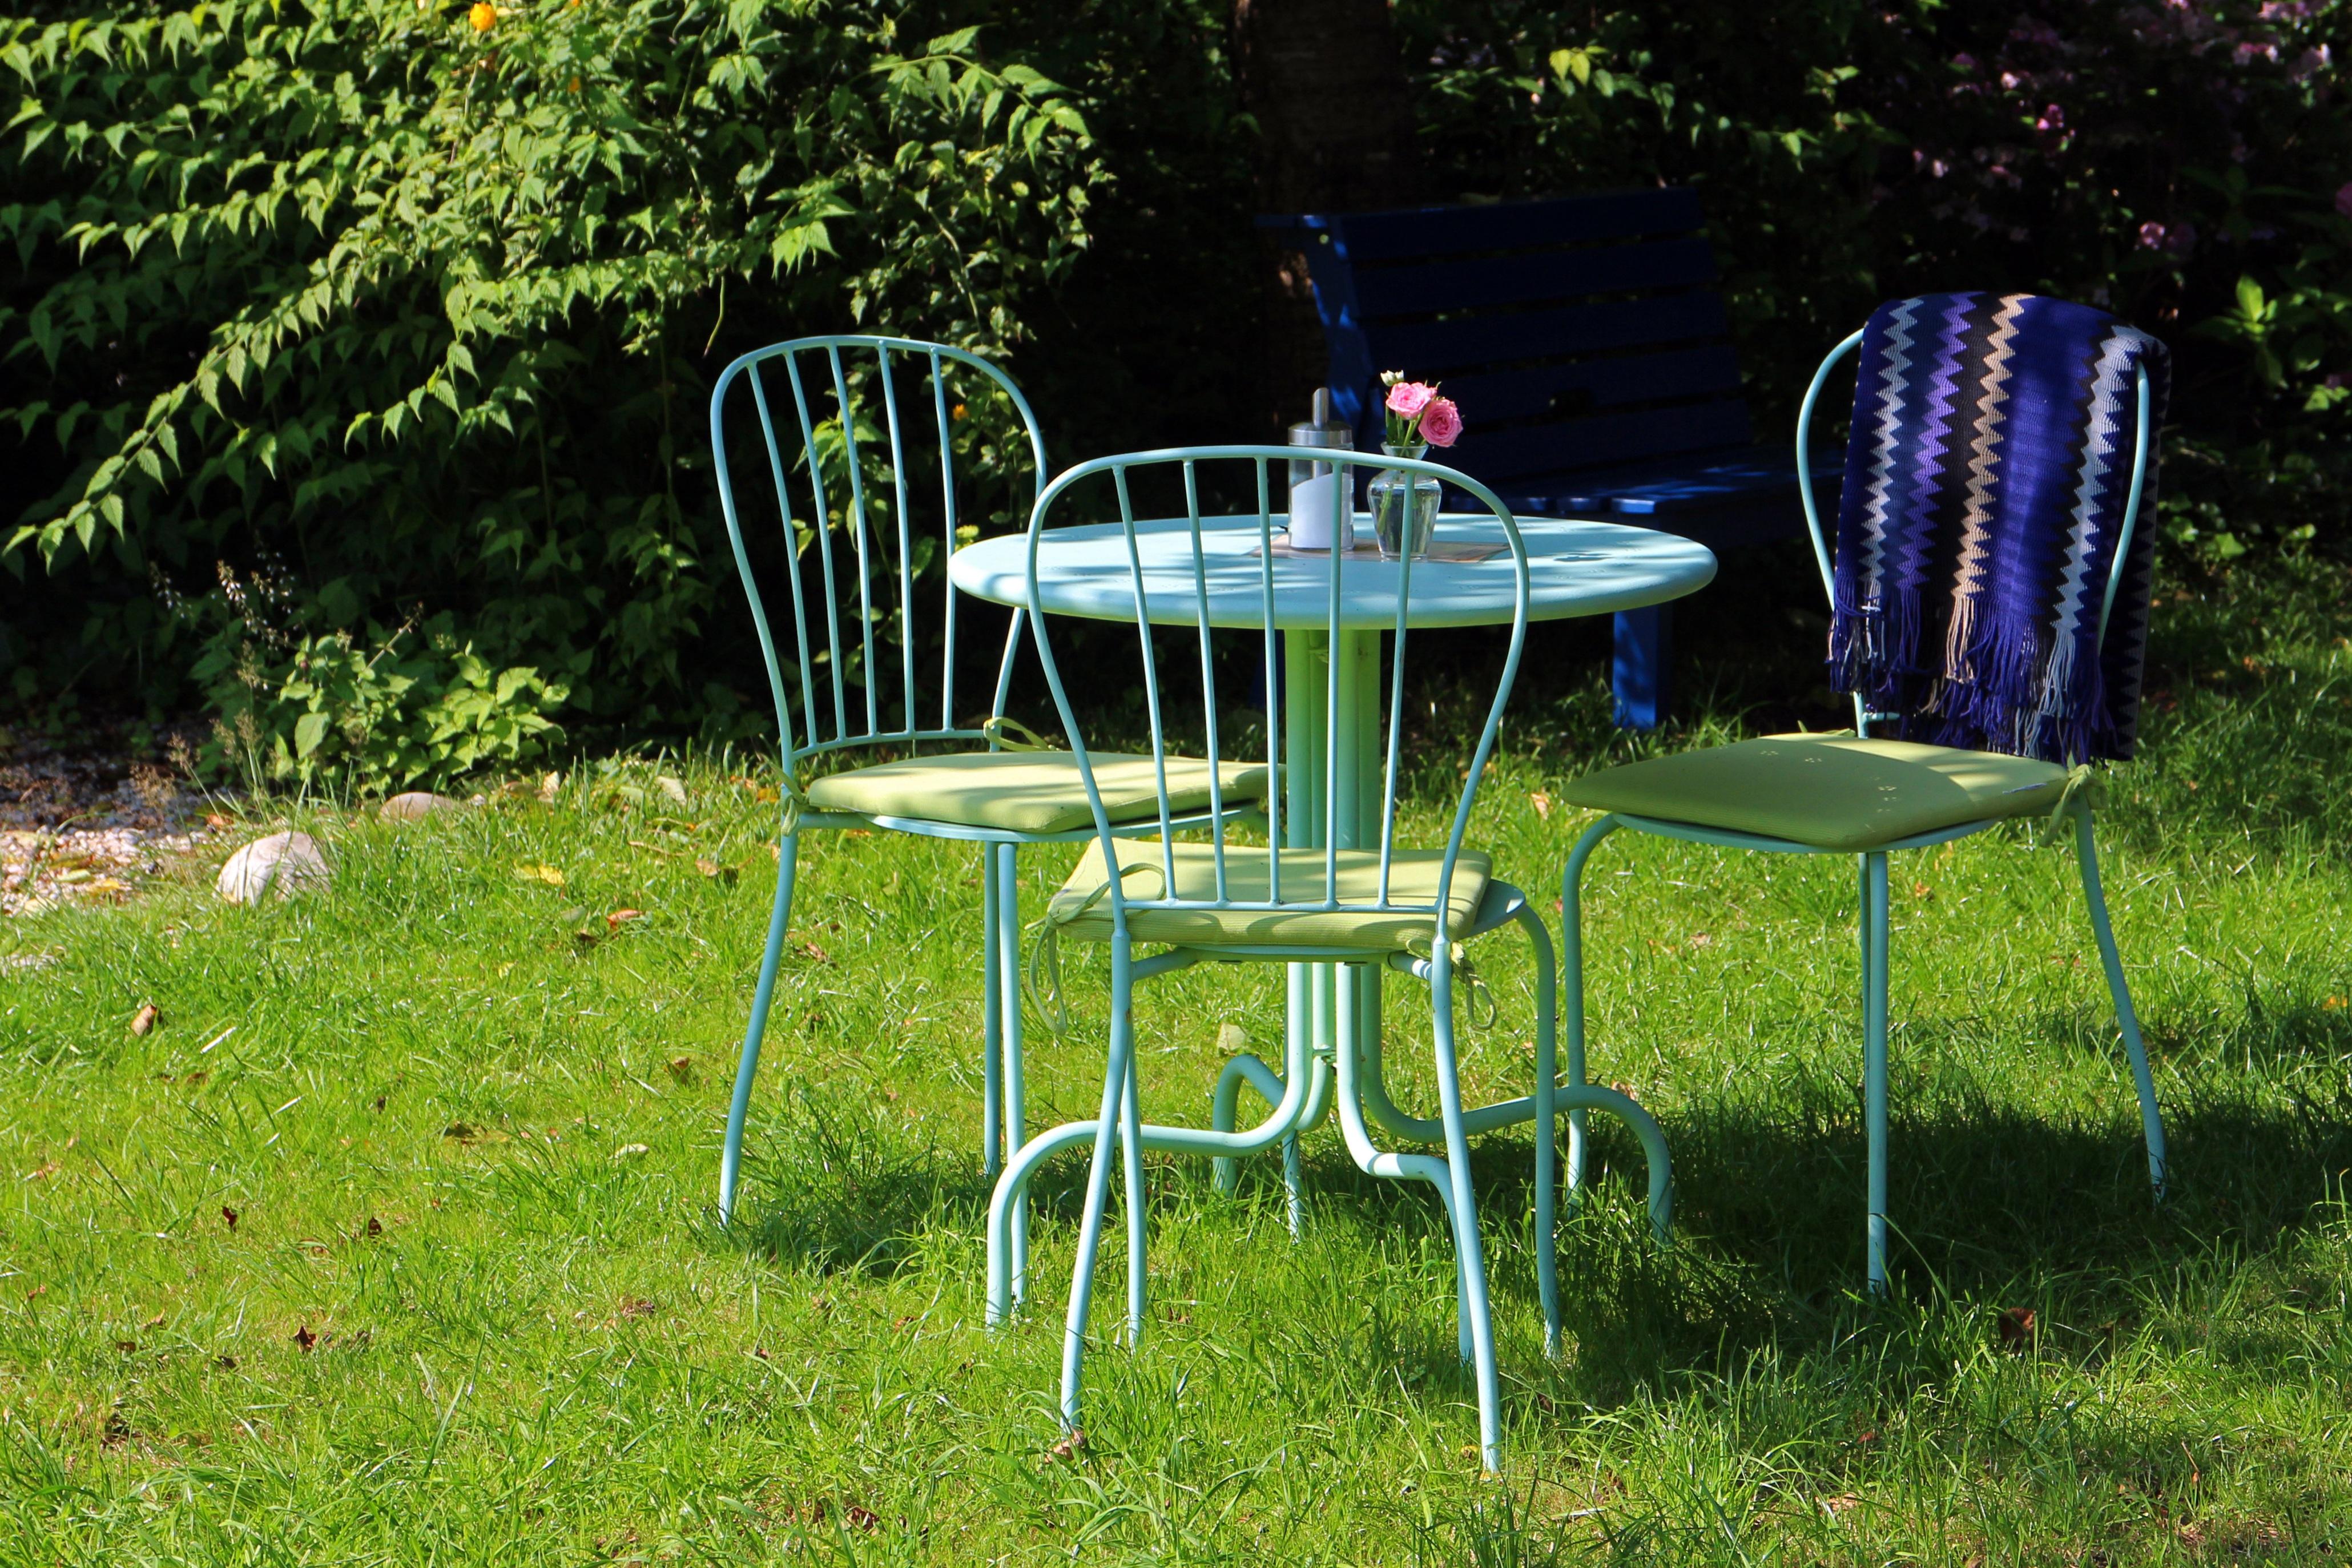 garden seating. Table Nature Grass Lawn Flower Seat Idyllic Green Backyard Rest Furniture Garden Chairs Break Yard Gastronomy Seating E